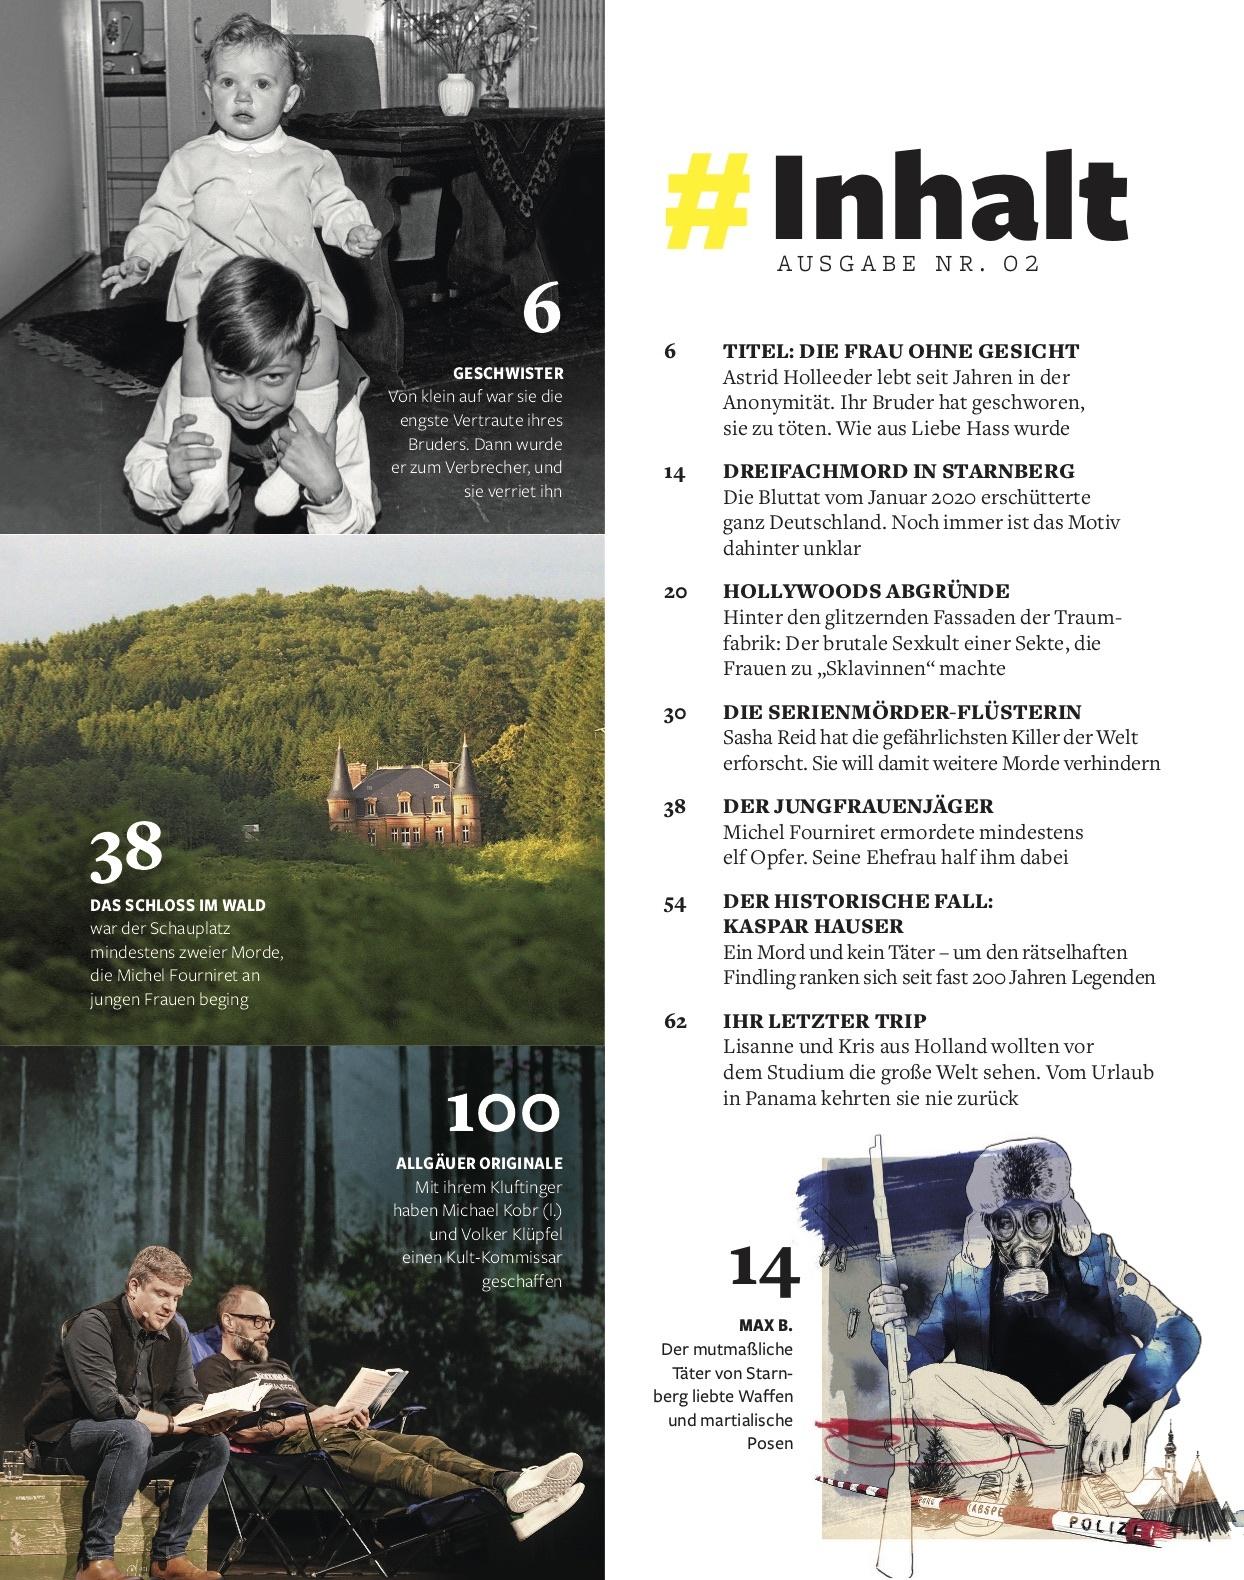 FOCUS Magazin FOCUS Sonderheft - Echte Verbrechen Nr. 02/2020